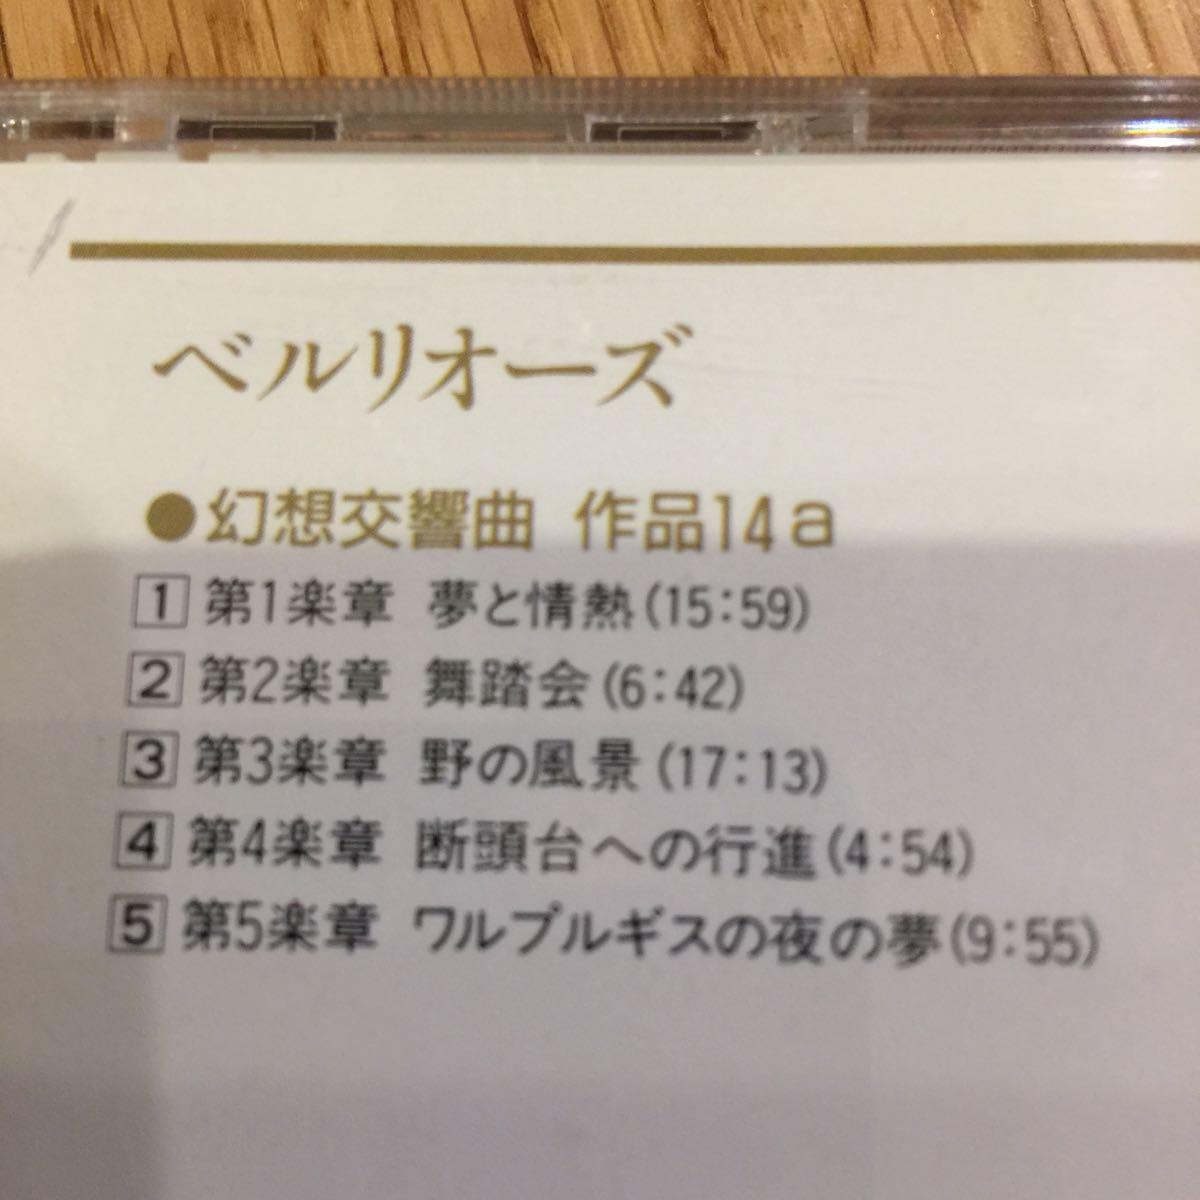 CD ベルリオーズ 交響曲 作品14a ダニエル・バレンボイム指揮 ベルリン・フィルハーモニー管弦楽団 BERLIOZ SYMPHONIES FANTASTIQUE_画像3